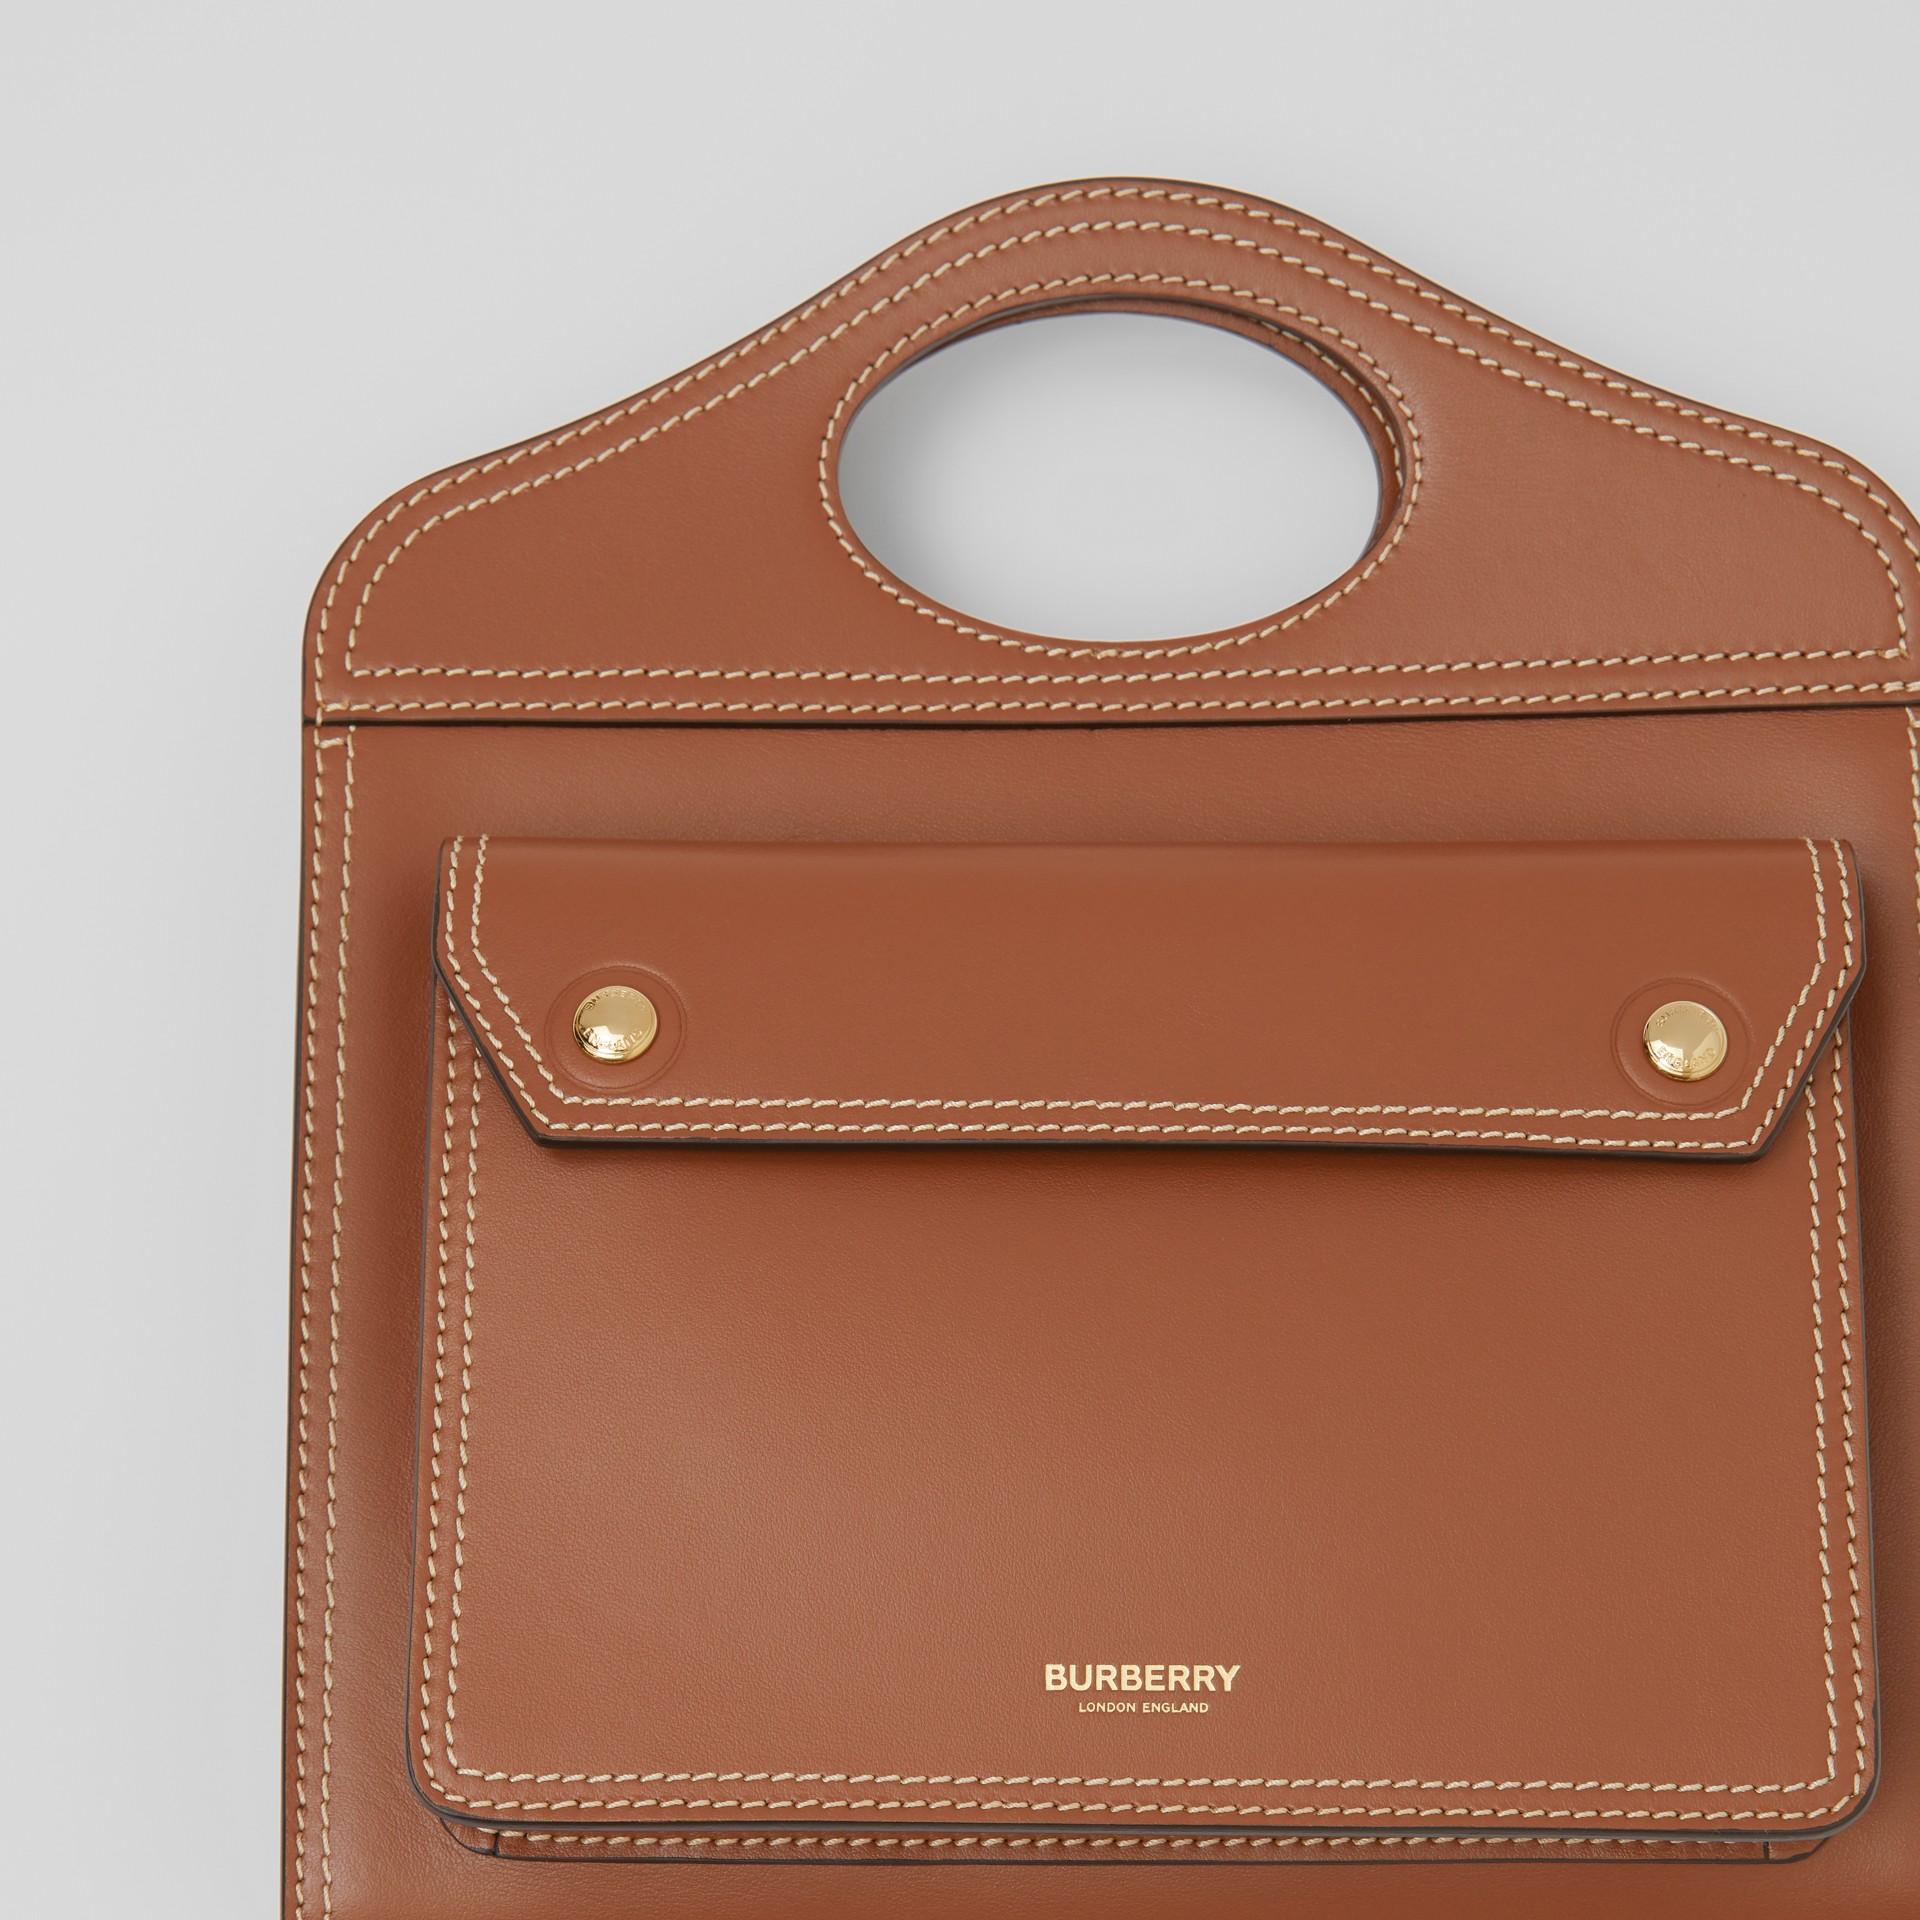 Mini Topstitch Detail Leather Pocket Bag in Malt Brown - Women | Burberry United Kingdom - gallery image 1